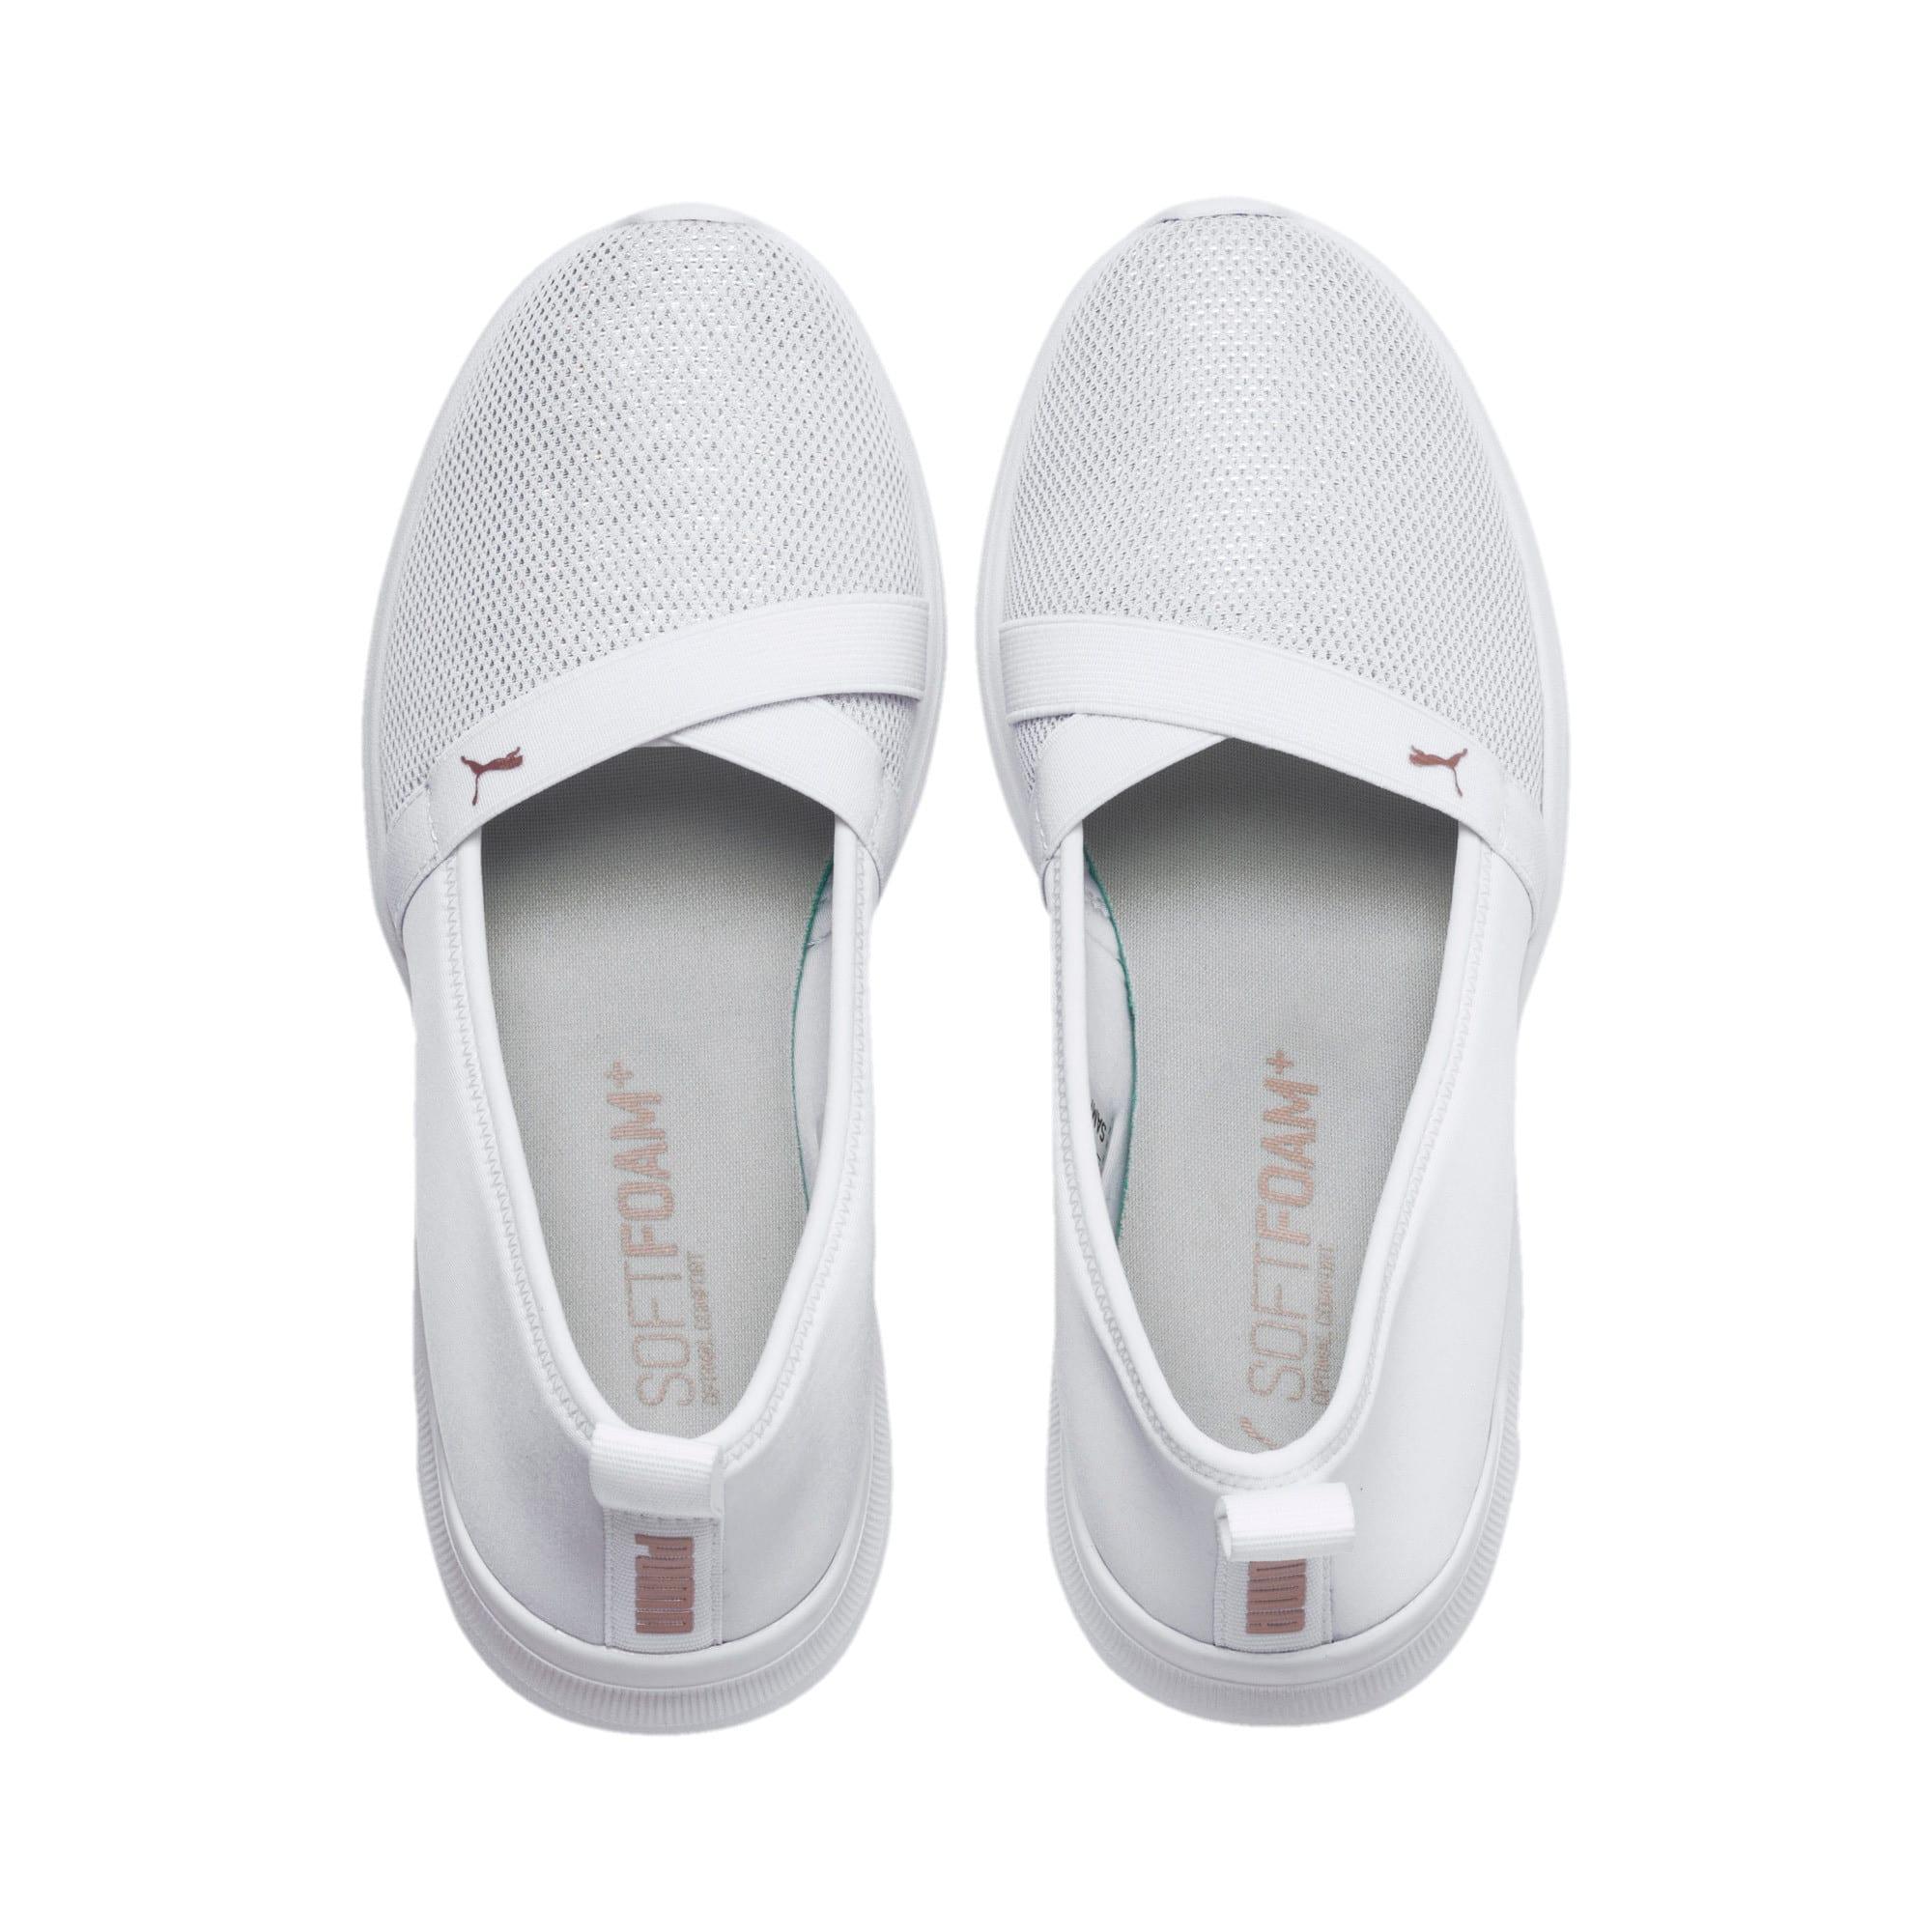 Thumbnail 6 of Adelina Sparkle Women's Ballet Shoes, Puma White-Rose Gold, medium